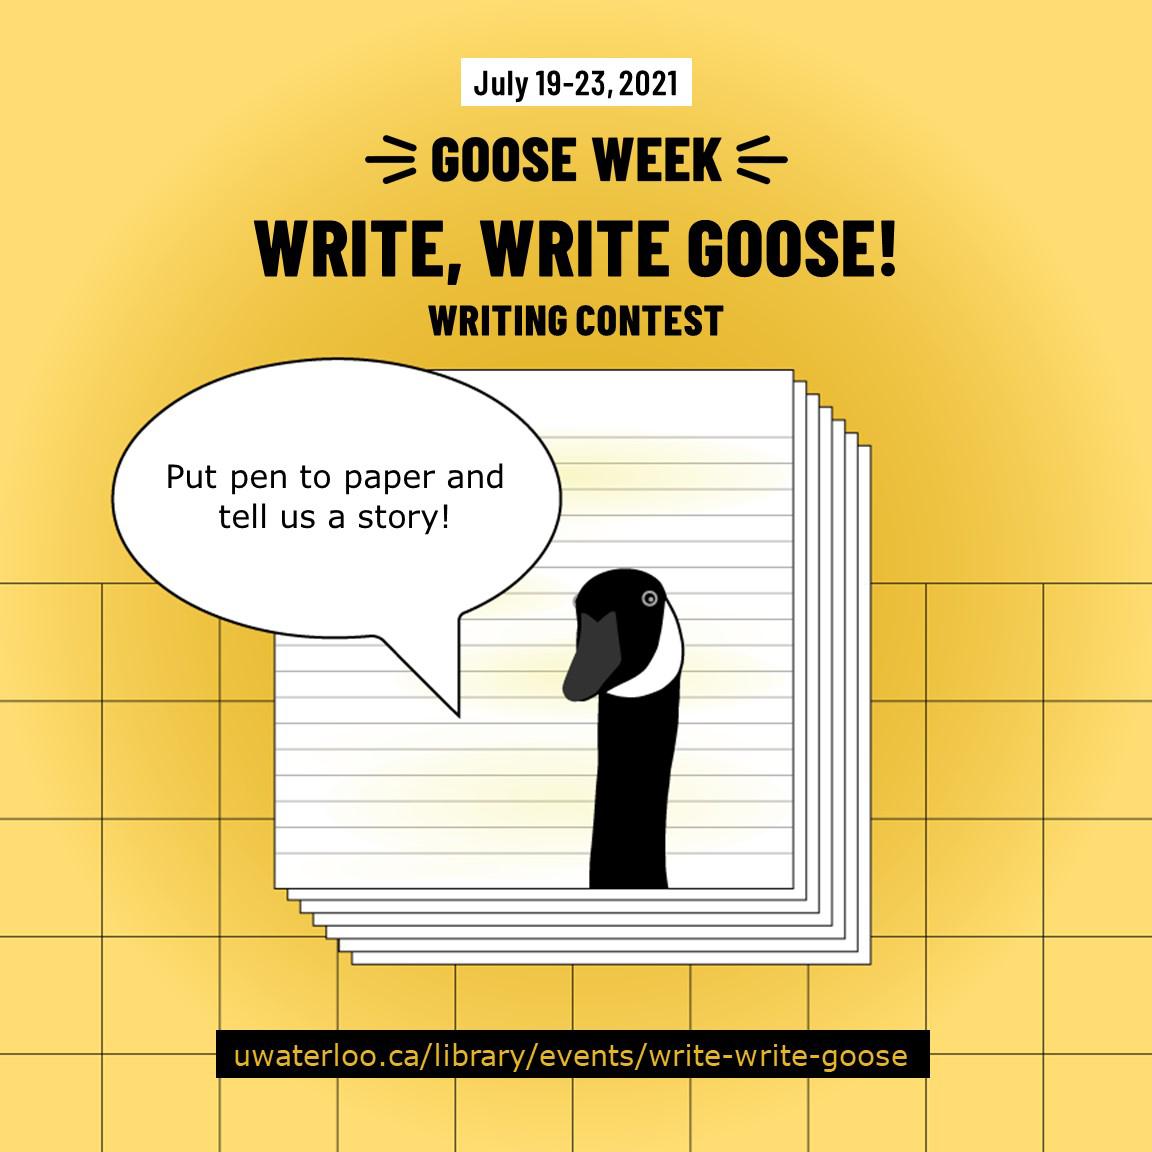 Goose Week Writing Contest